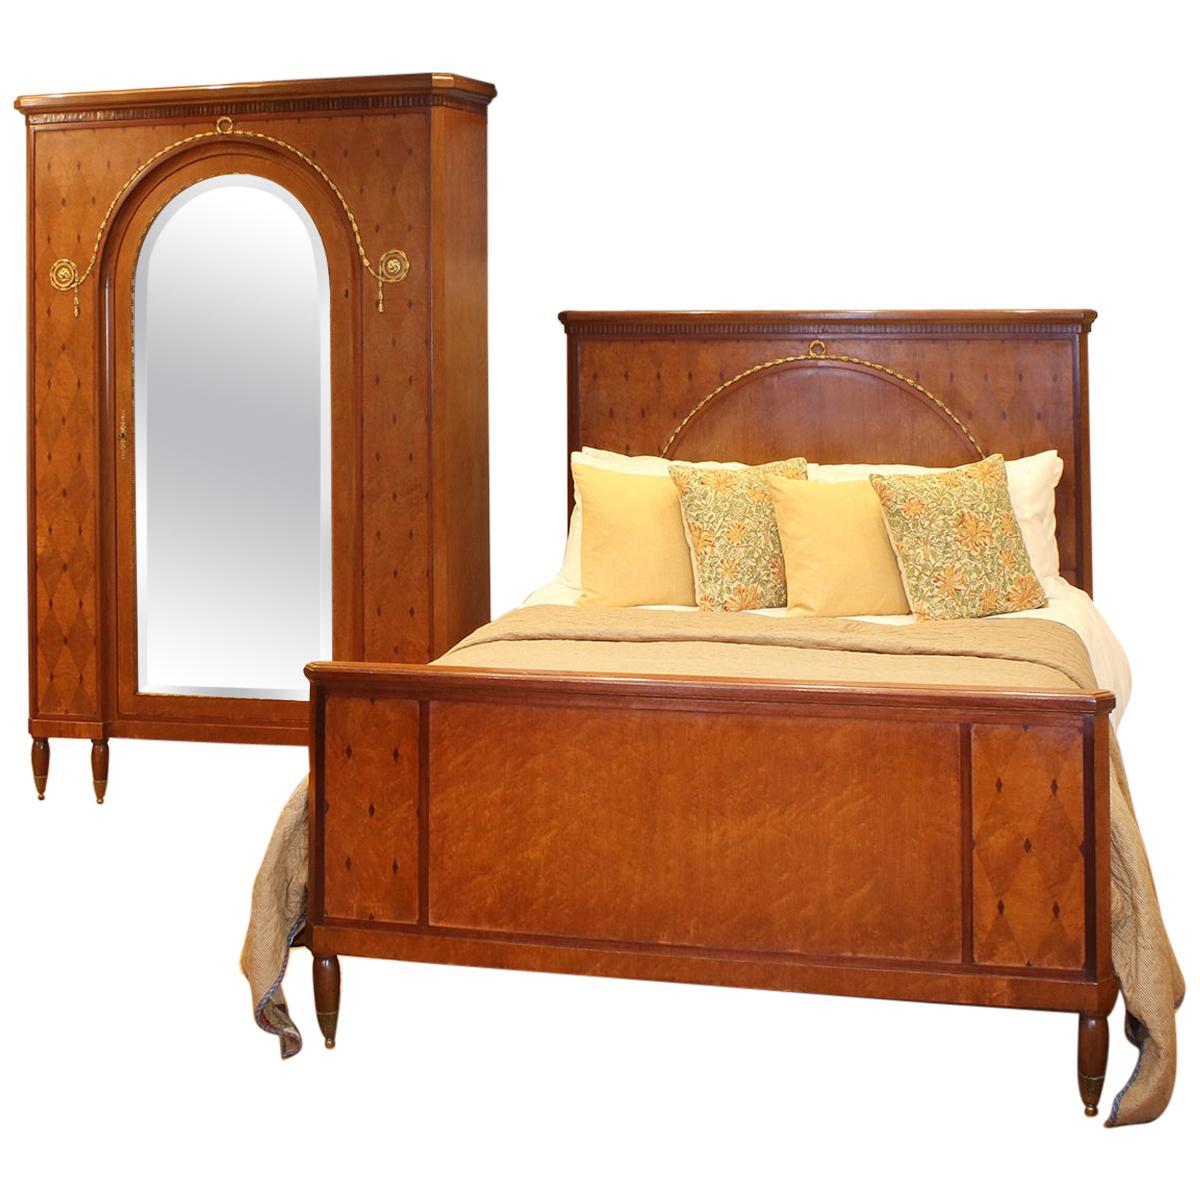 mercier freres two piece bedroom set wk142